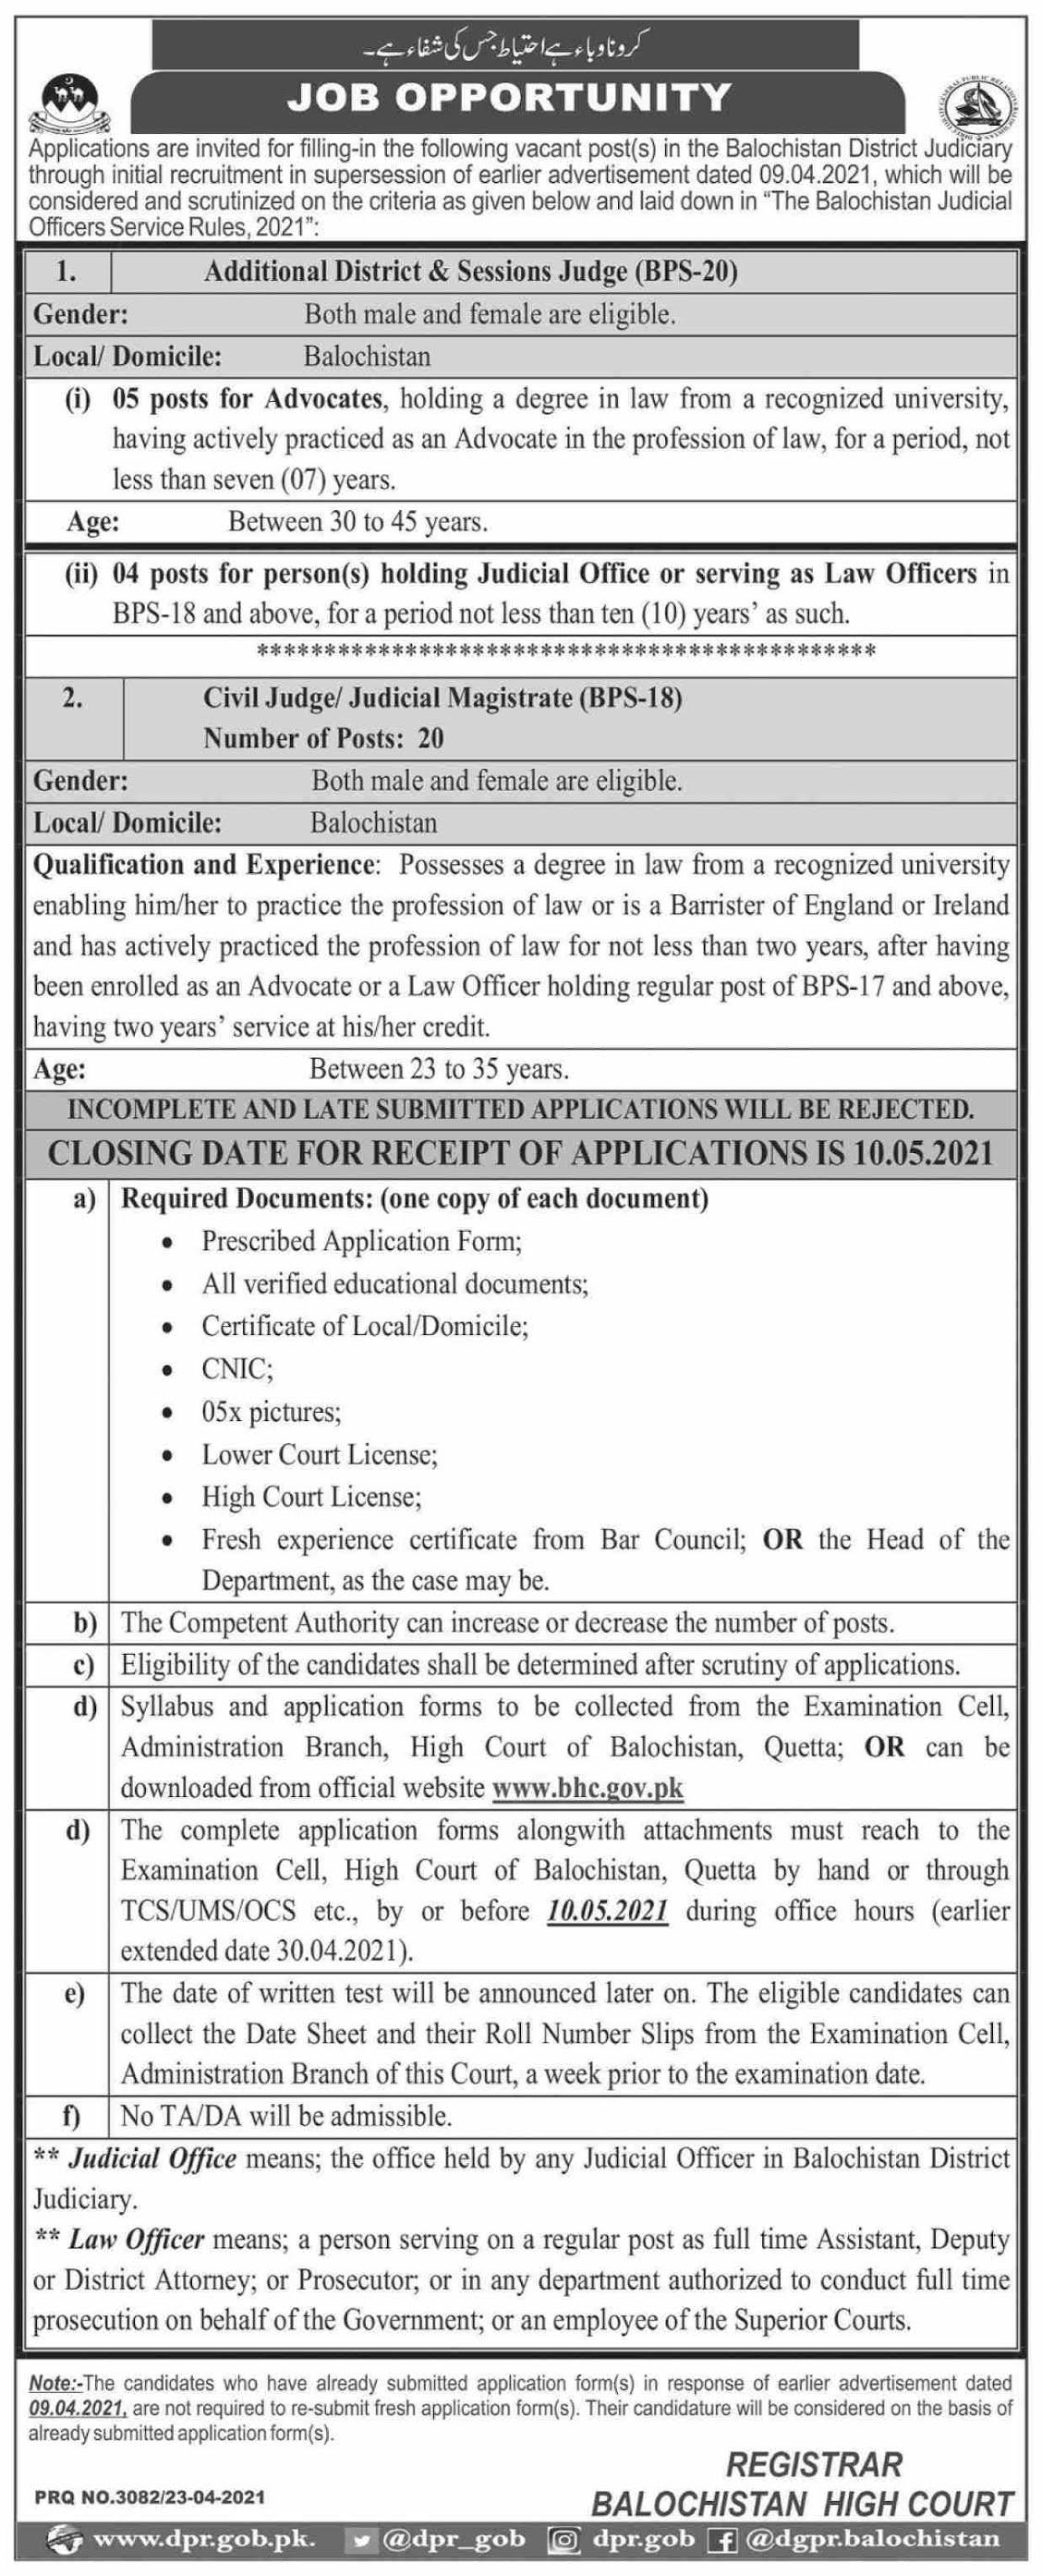 www.bhc.gov.pk Jobs 2021 - Balochistan High Court Jobs 2021 in Pakistan - Download BHC Job Application Form